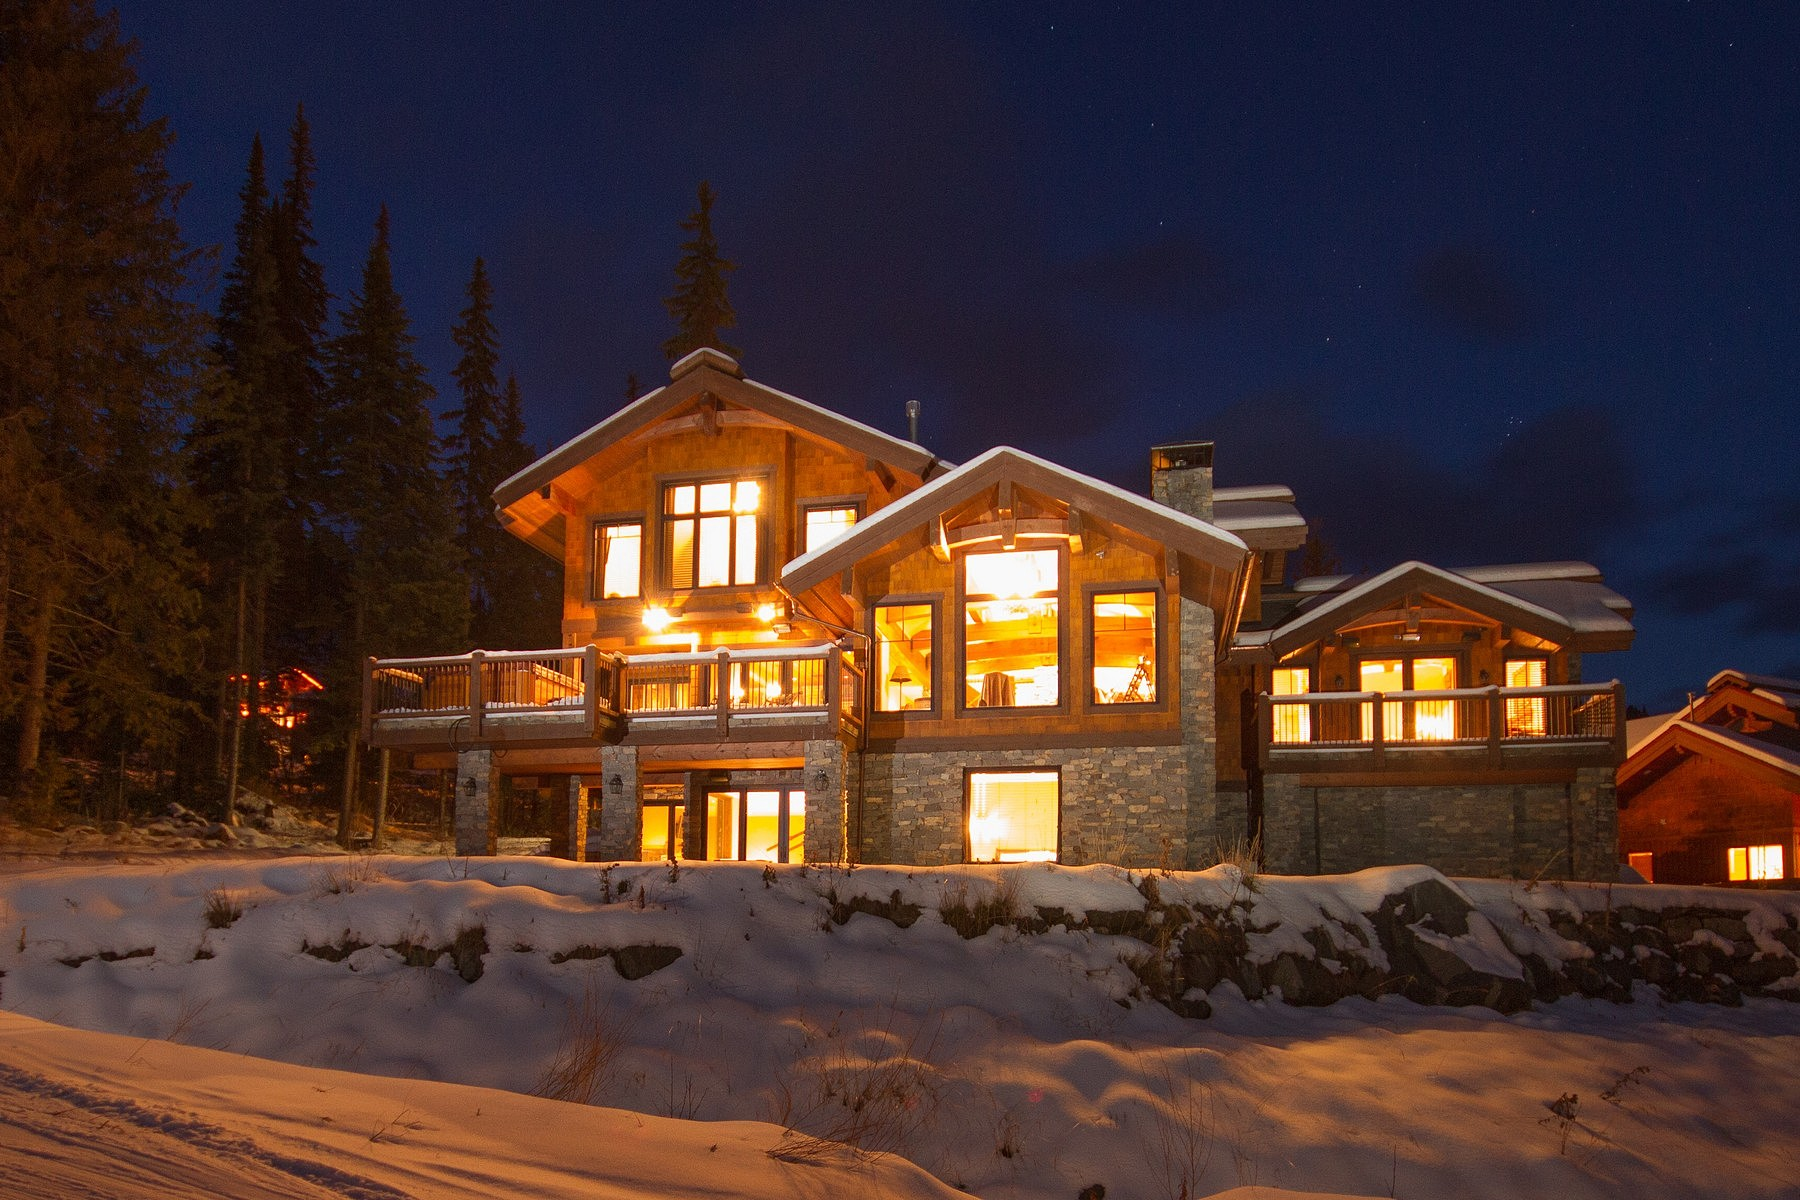 Moradia para Venda às Premium Slope Side Mountain Chalet 4121 Sundance Drive Sun Peaks, Columbia Britanica, V0E 5N0 Canadá